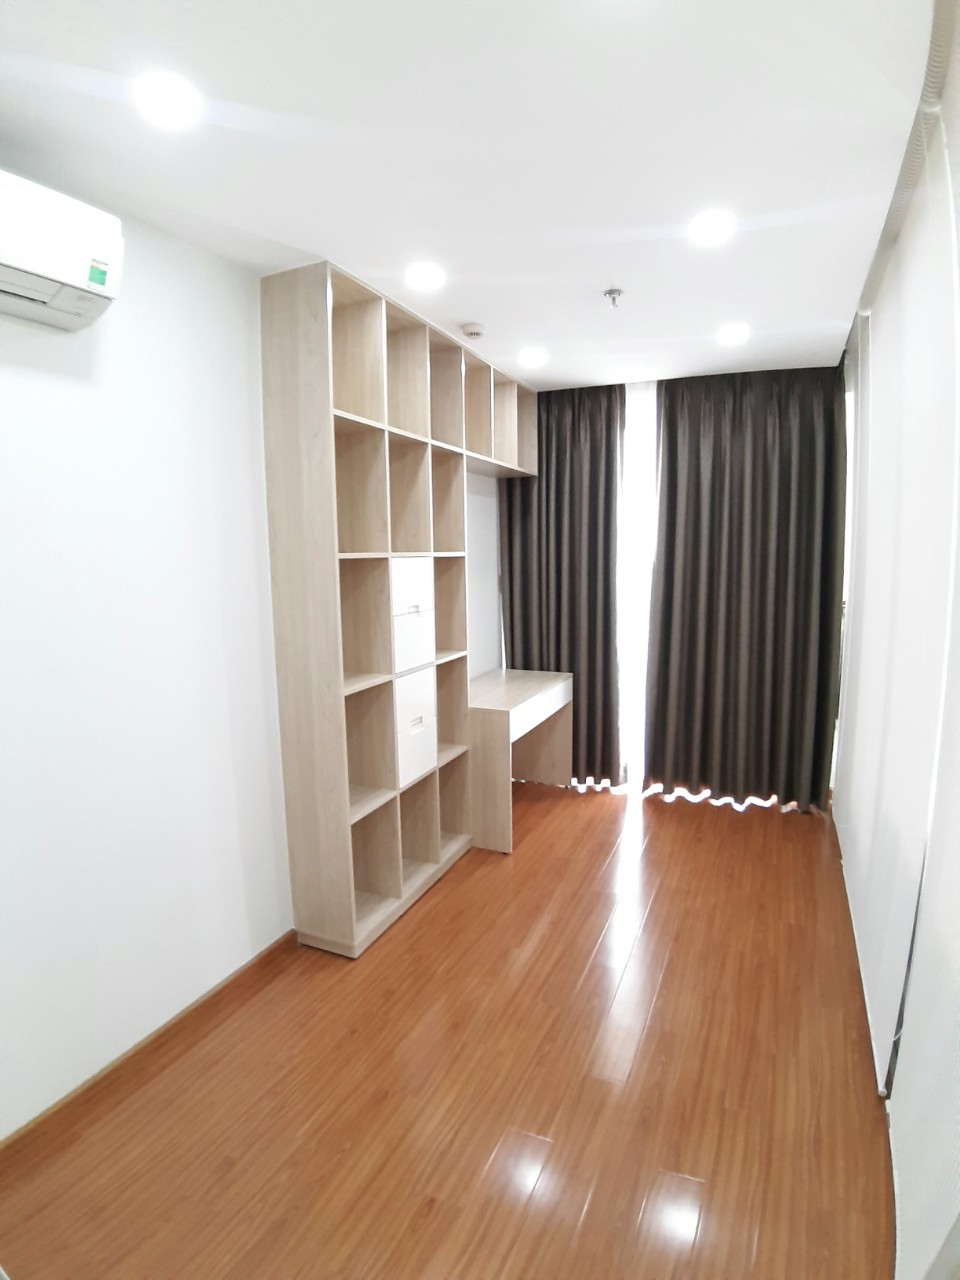 22bedrooms for rent in scenic  valley